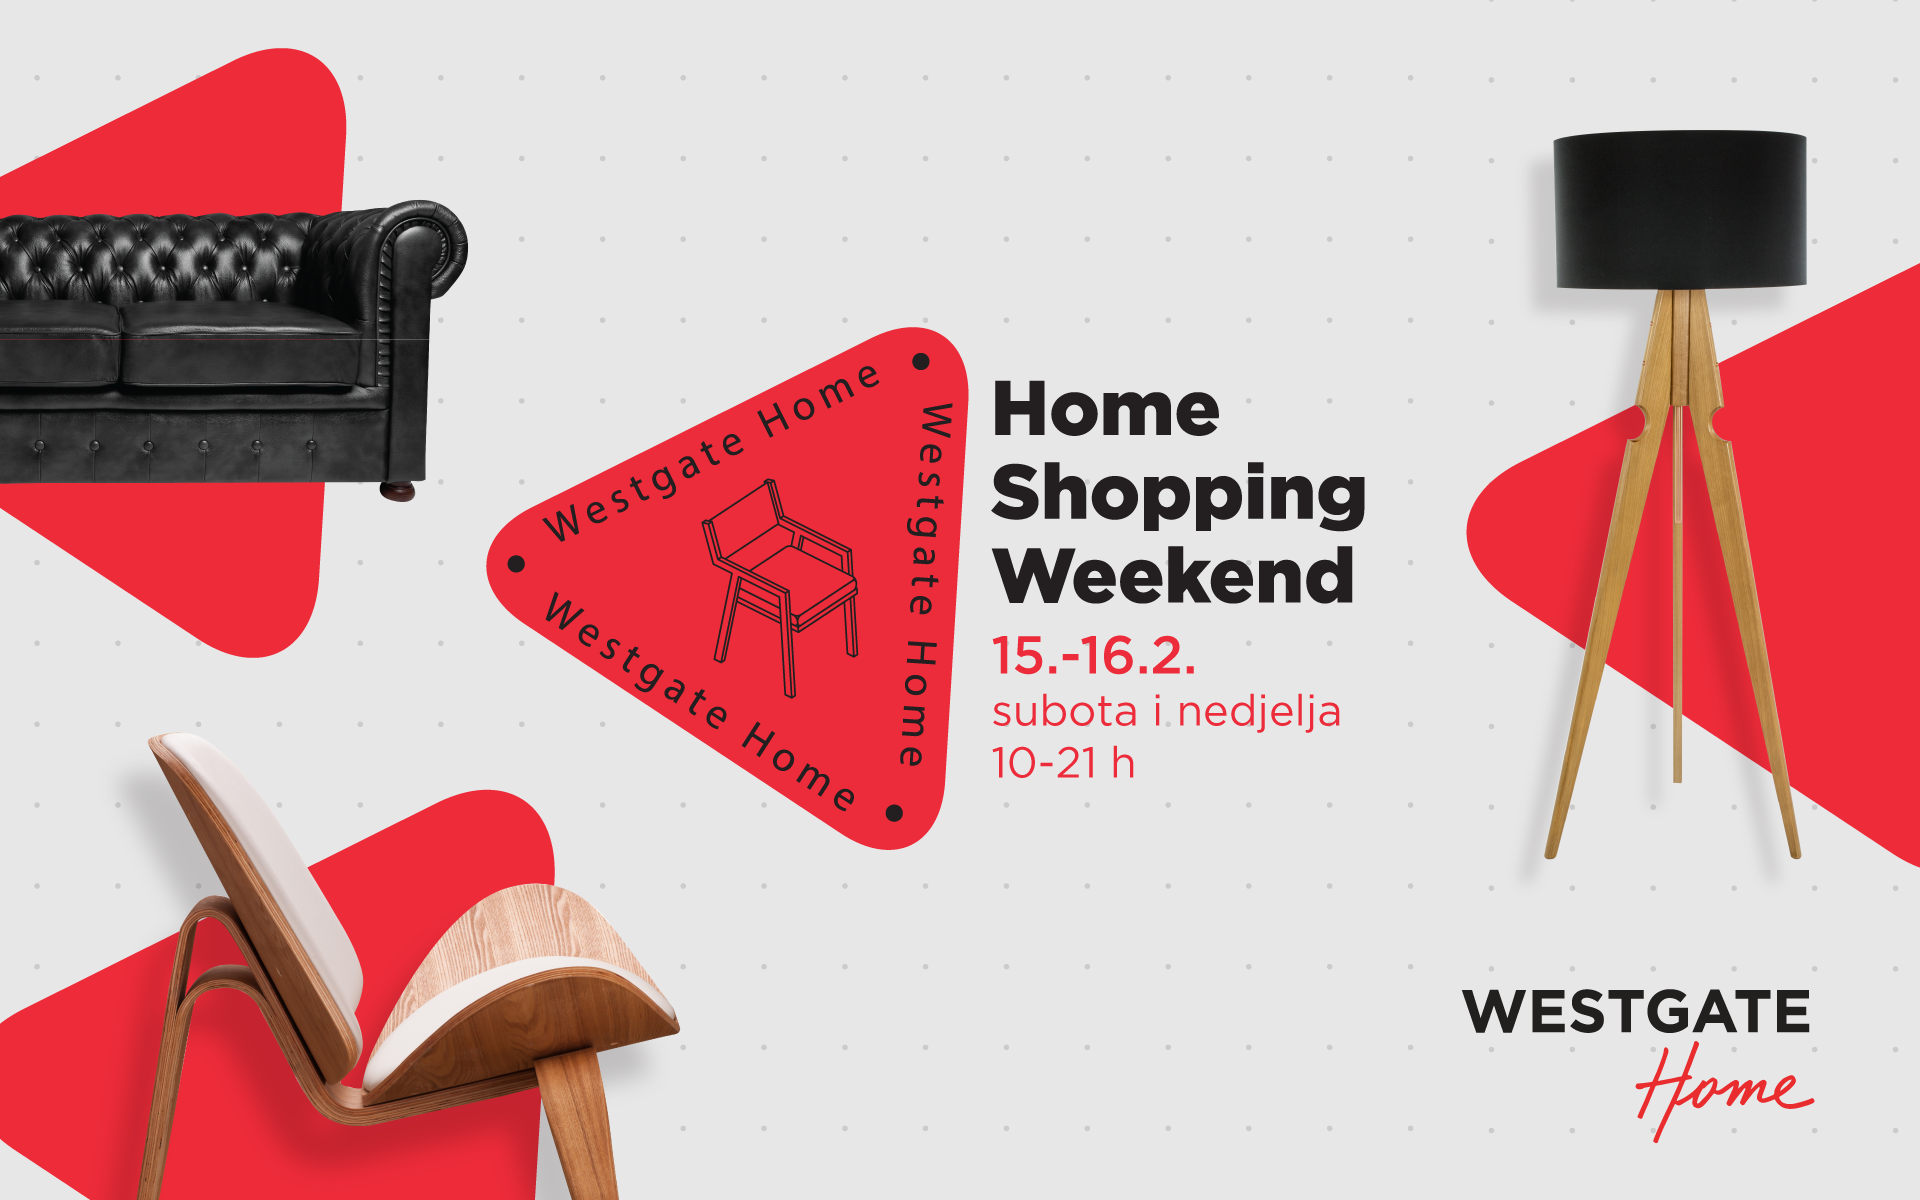 Home Shopping Weekend 15. - 16.2.